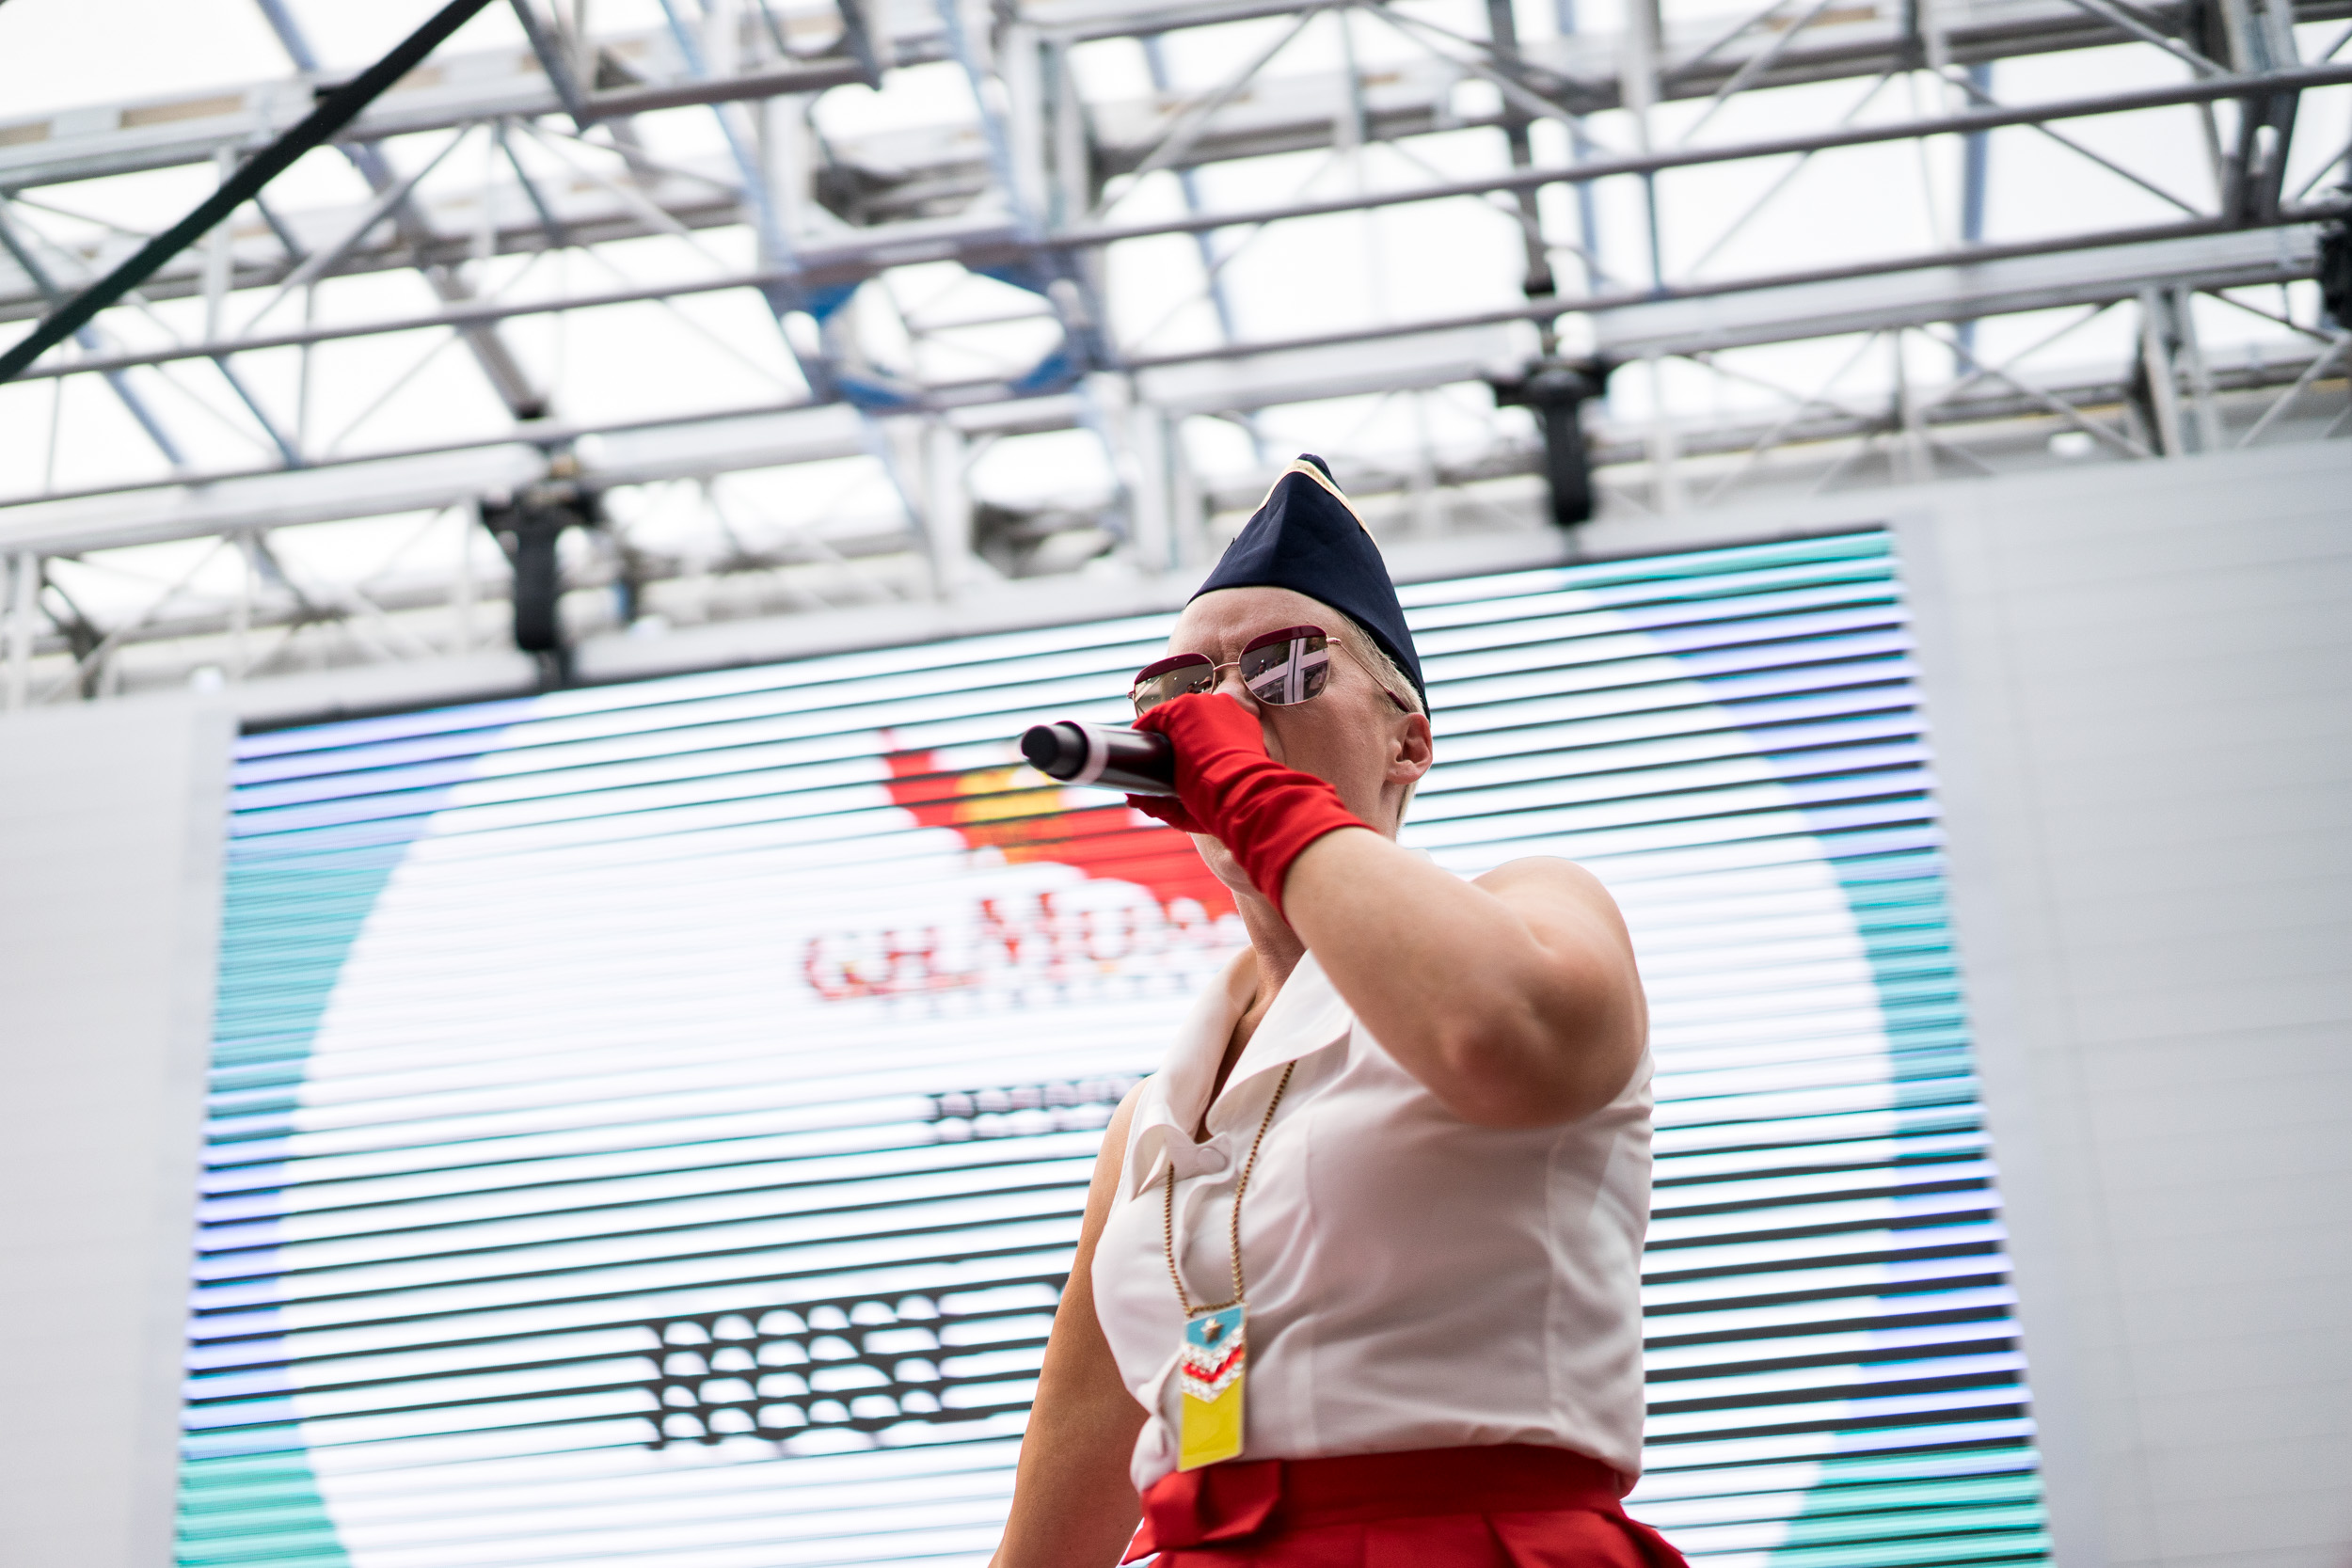 ghmumm-roddgunn-melbourne-spring-carnival12